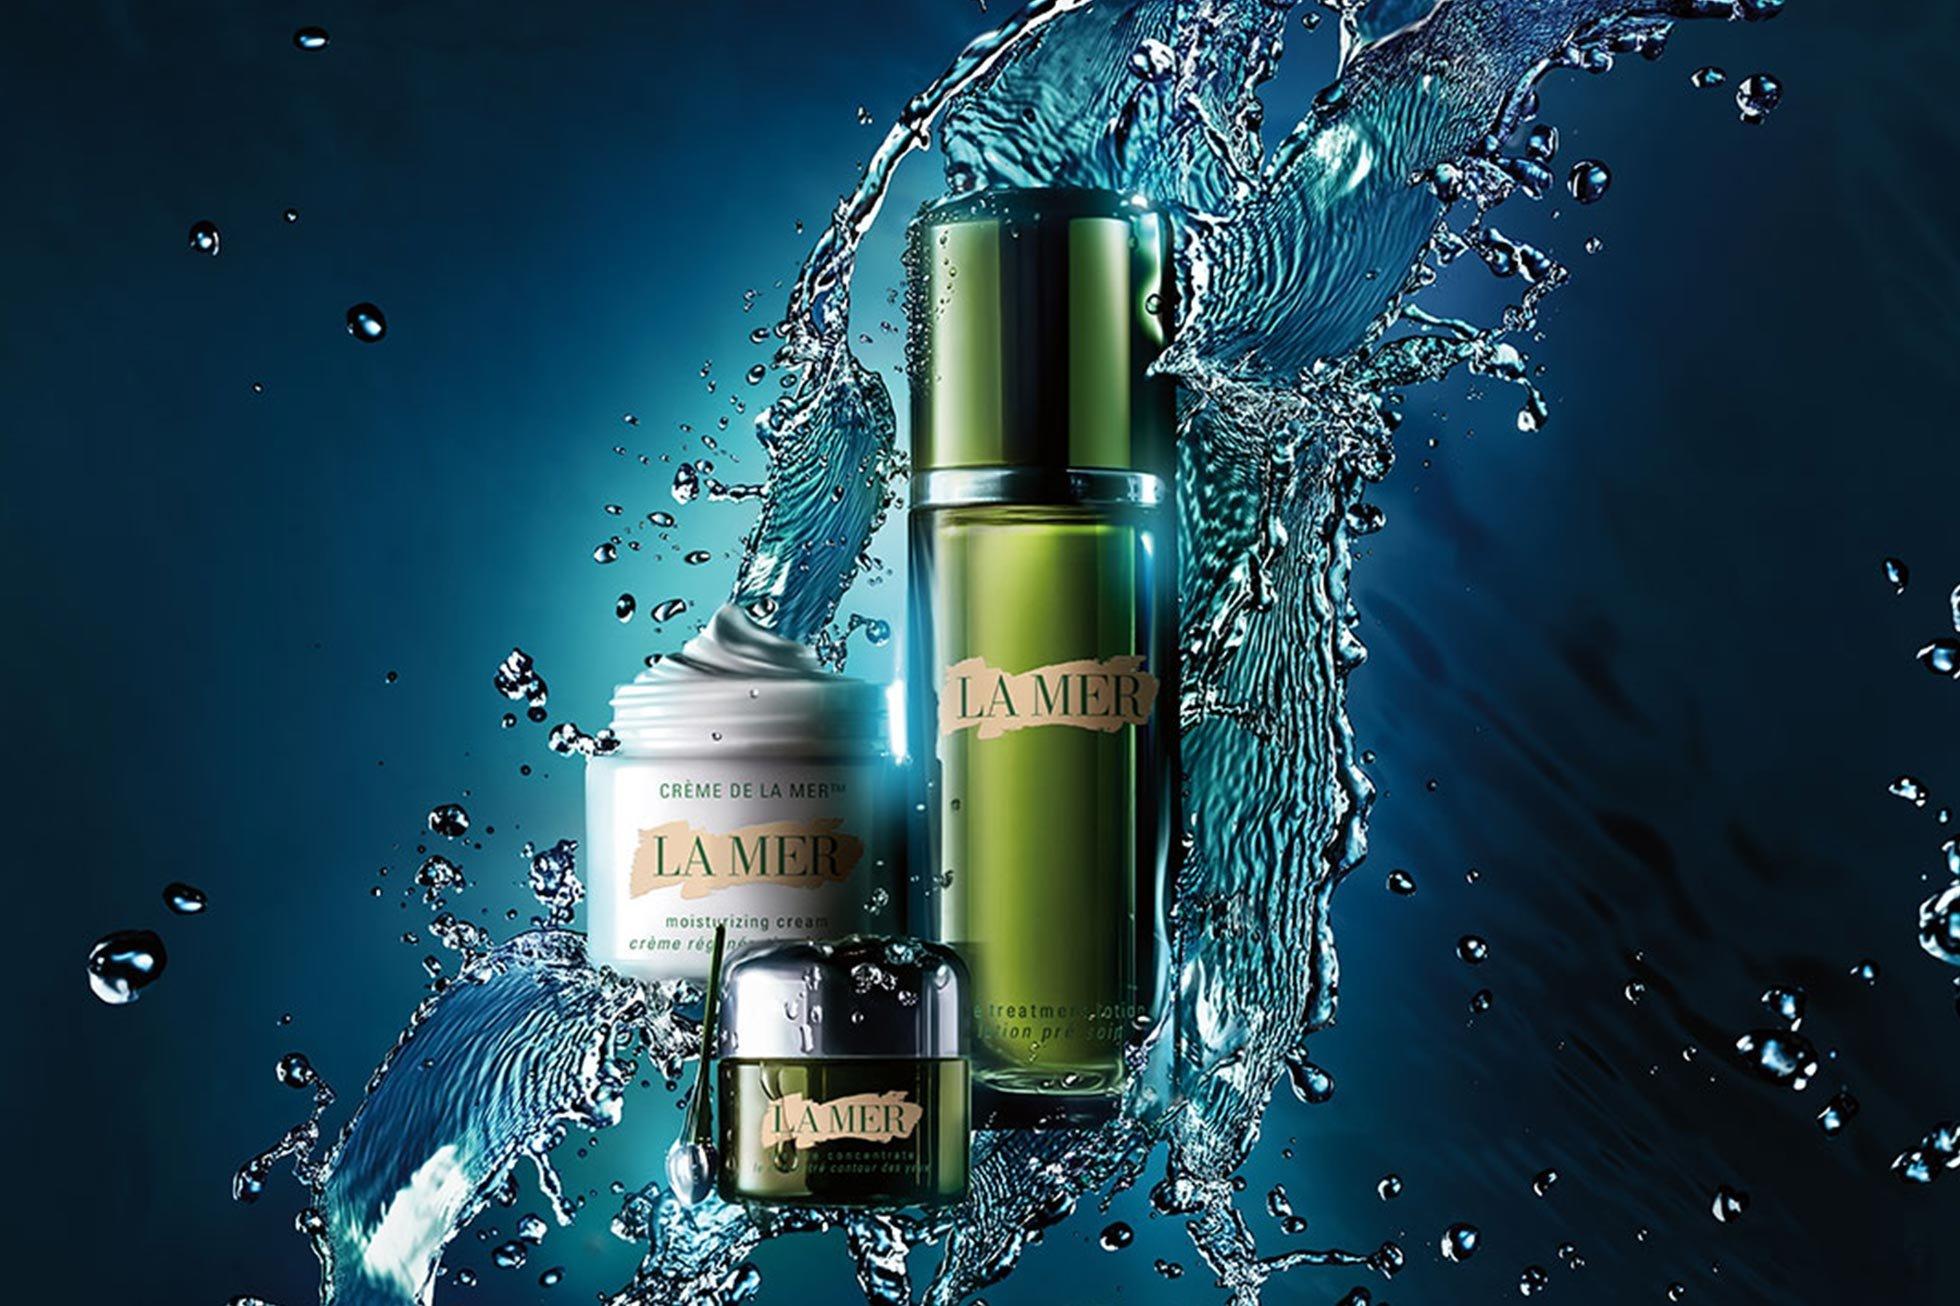 Shop La Mer Essentials on Beautylish